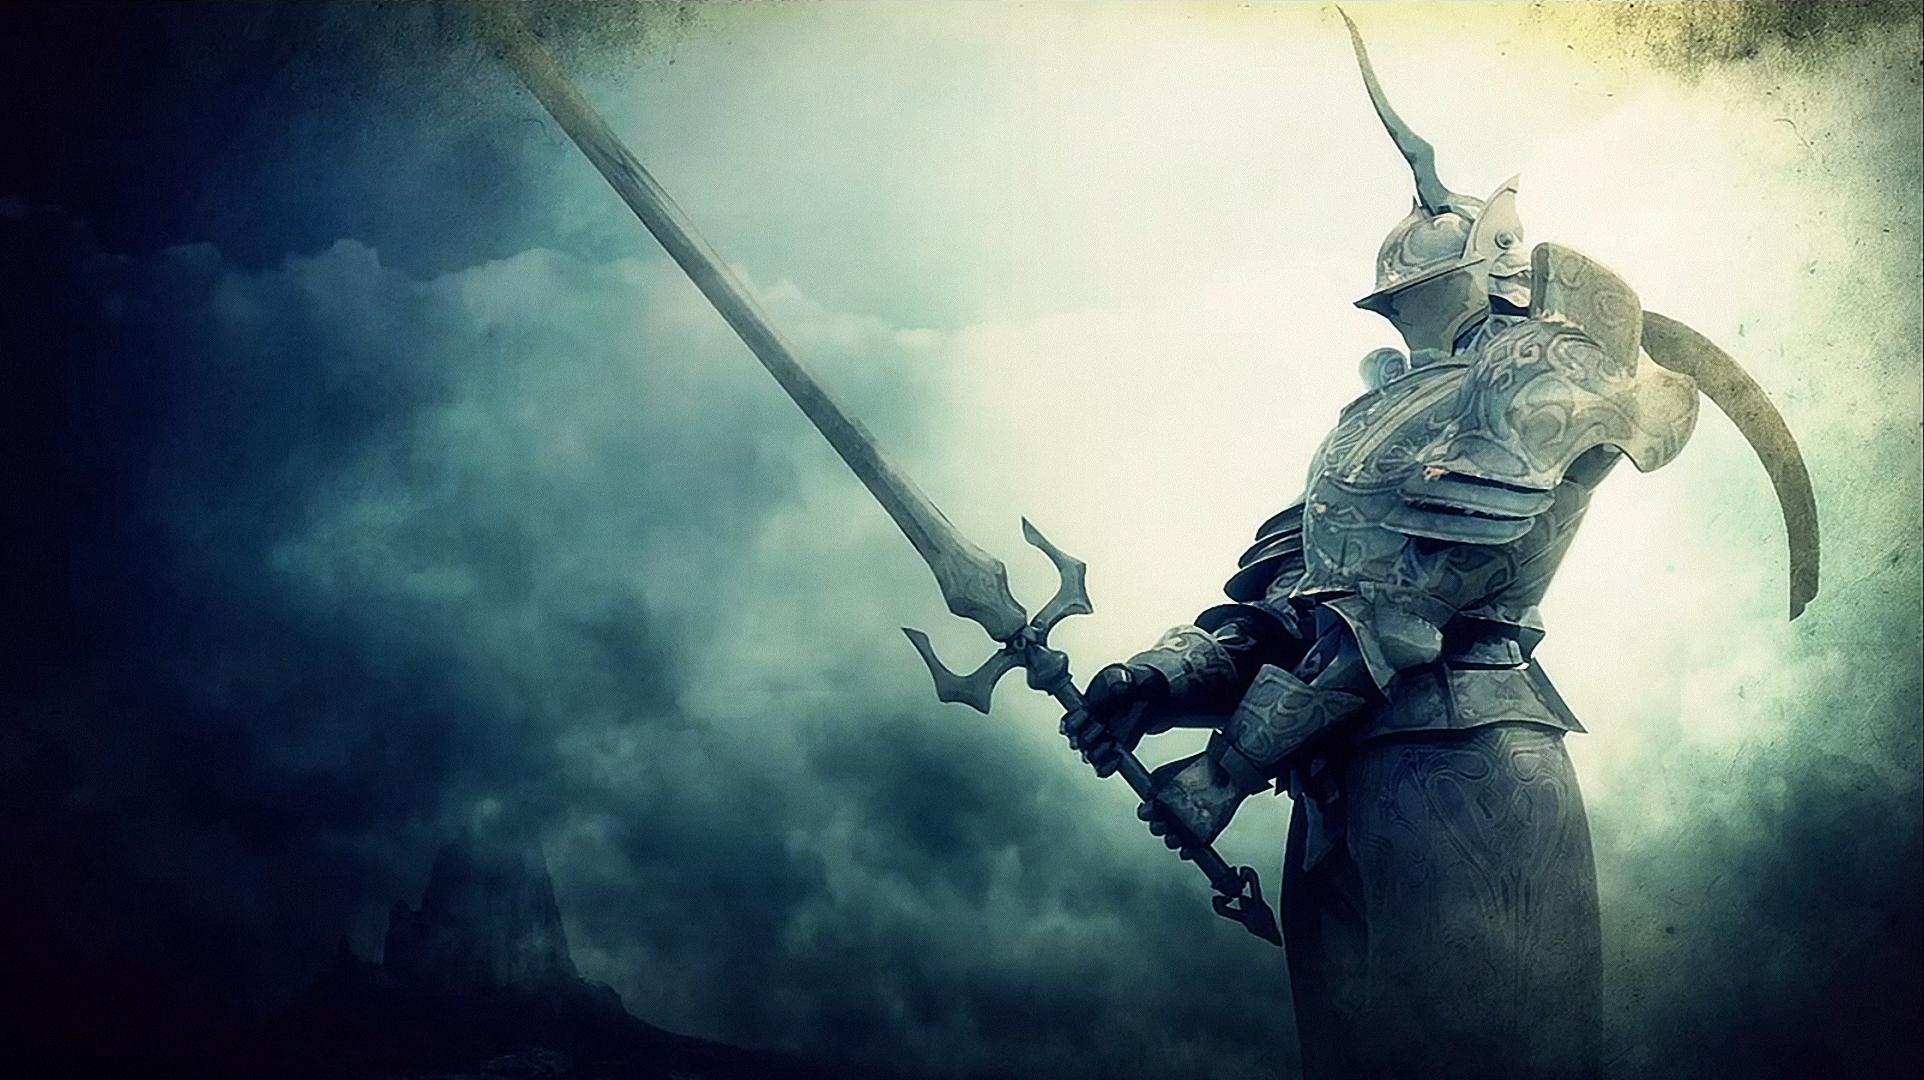 General 1924x1080 Demon's Souls video games knight sword